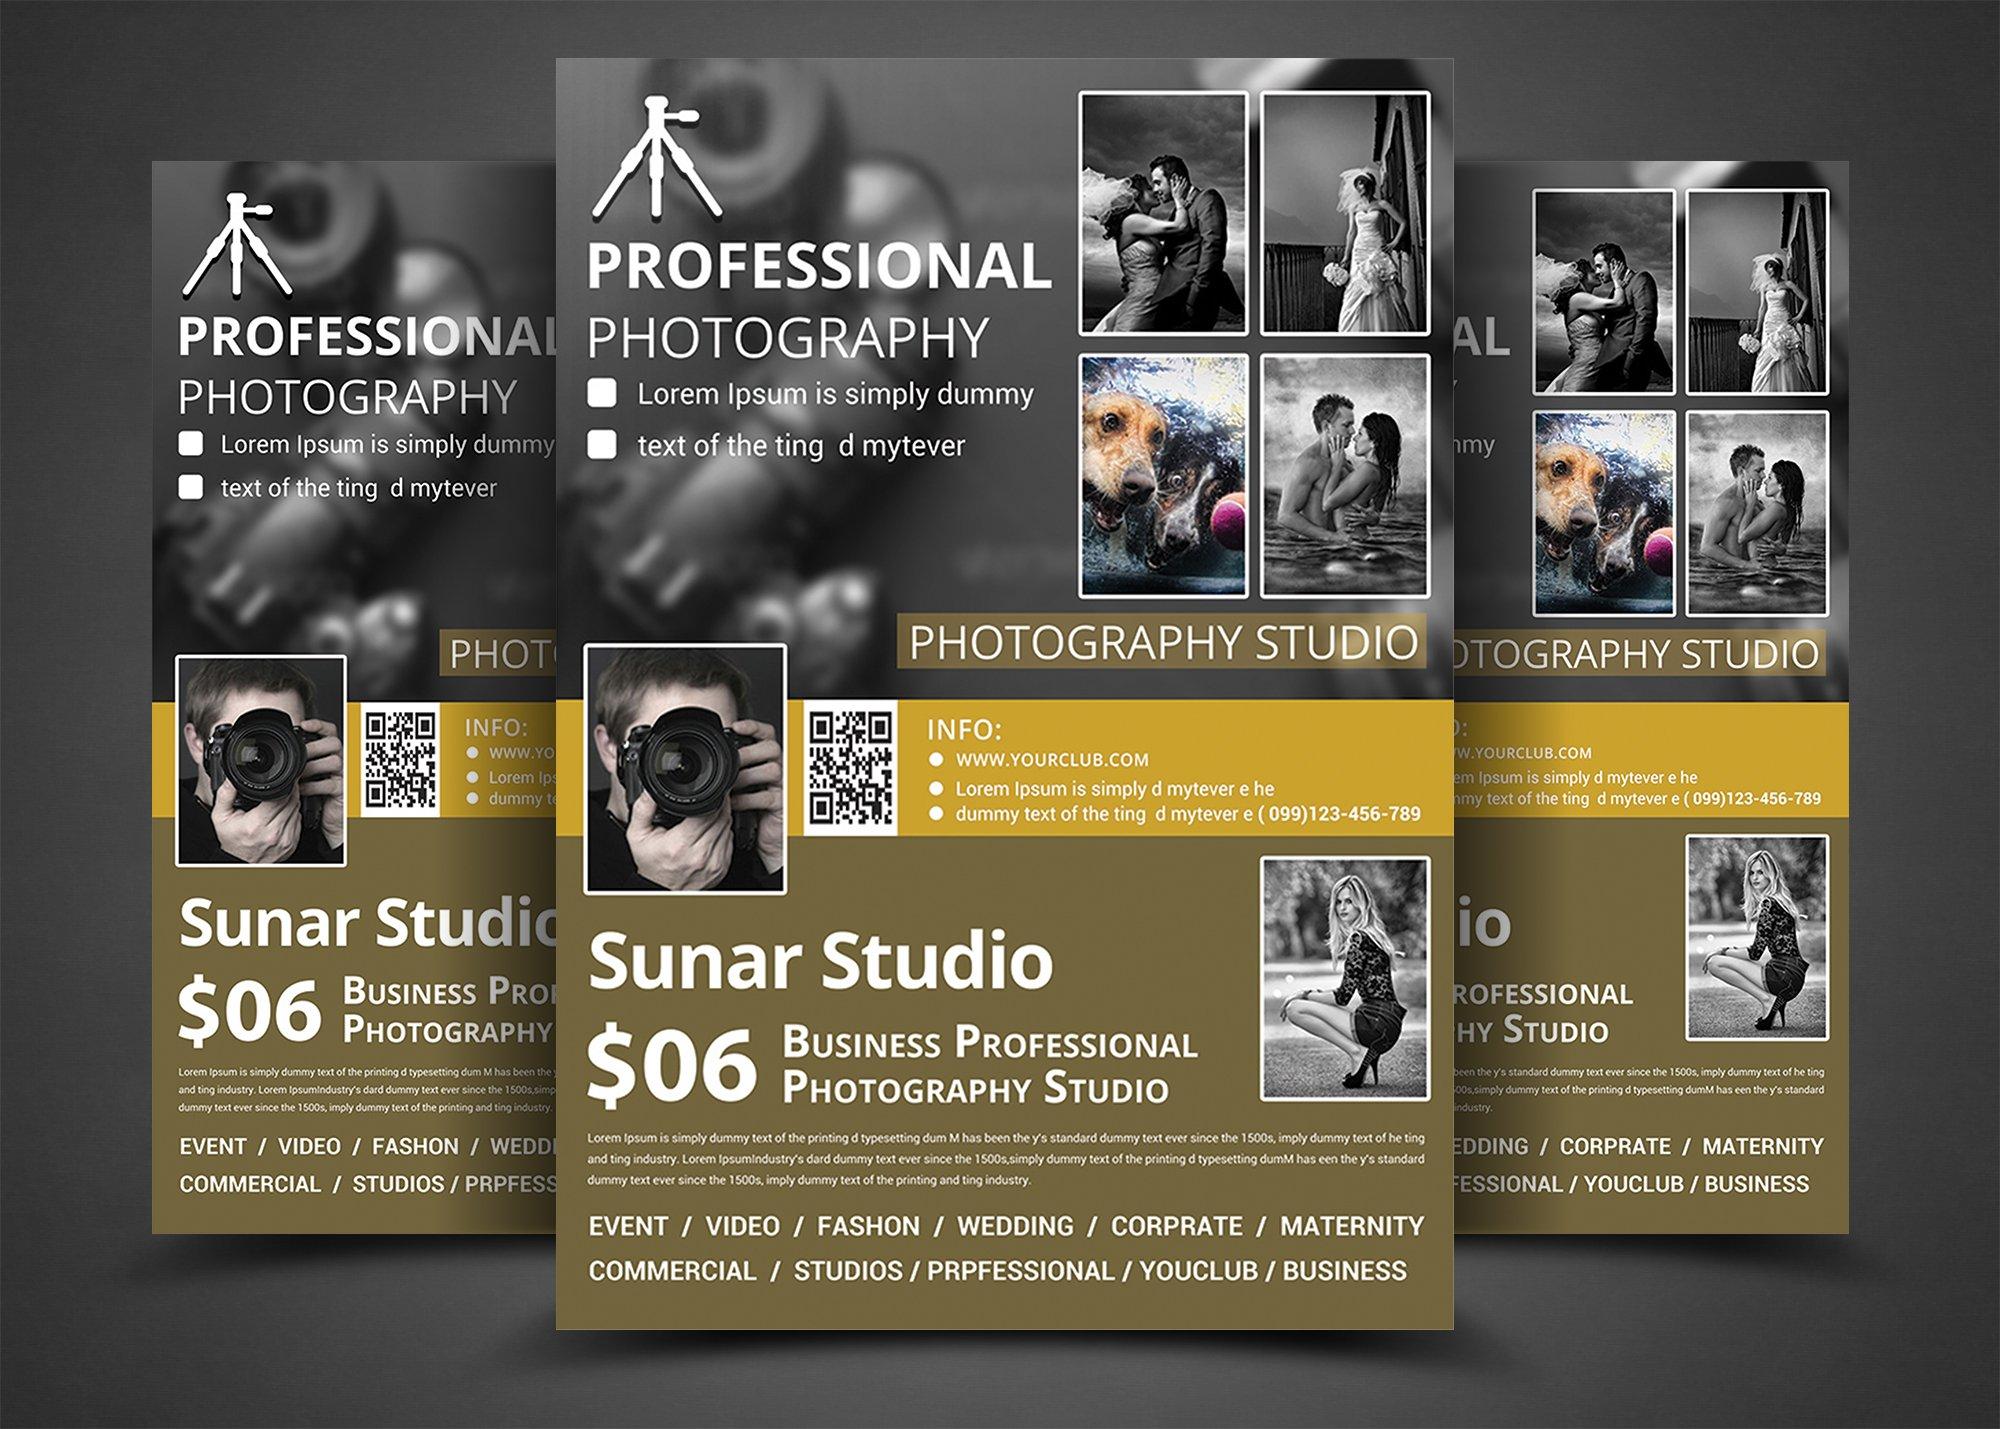 photography studio flyer templates flyer templates creative market. Black Bedroom Furniture Sets. Home Design Ideas